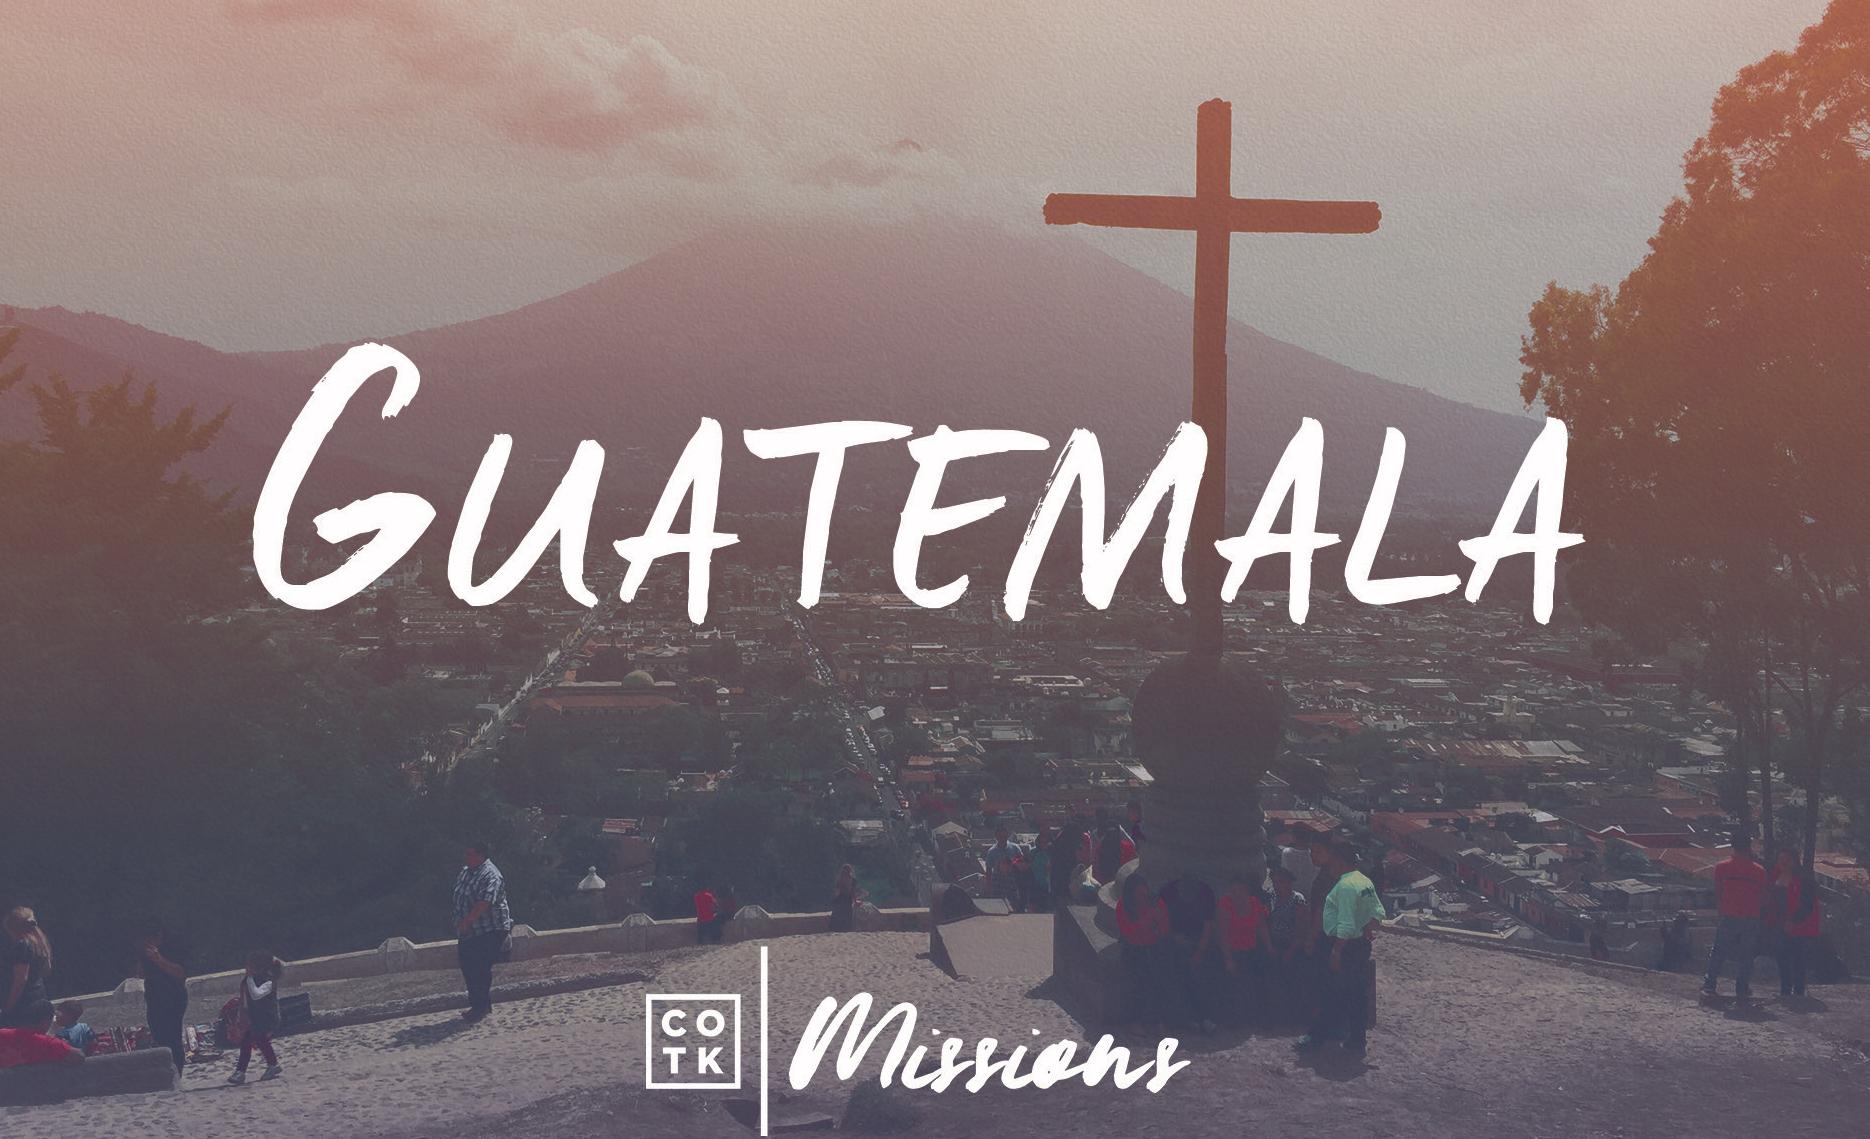 Guatemala Card front-1 copy.jpg